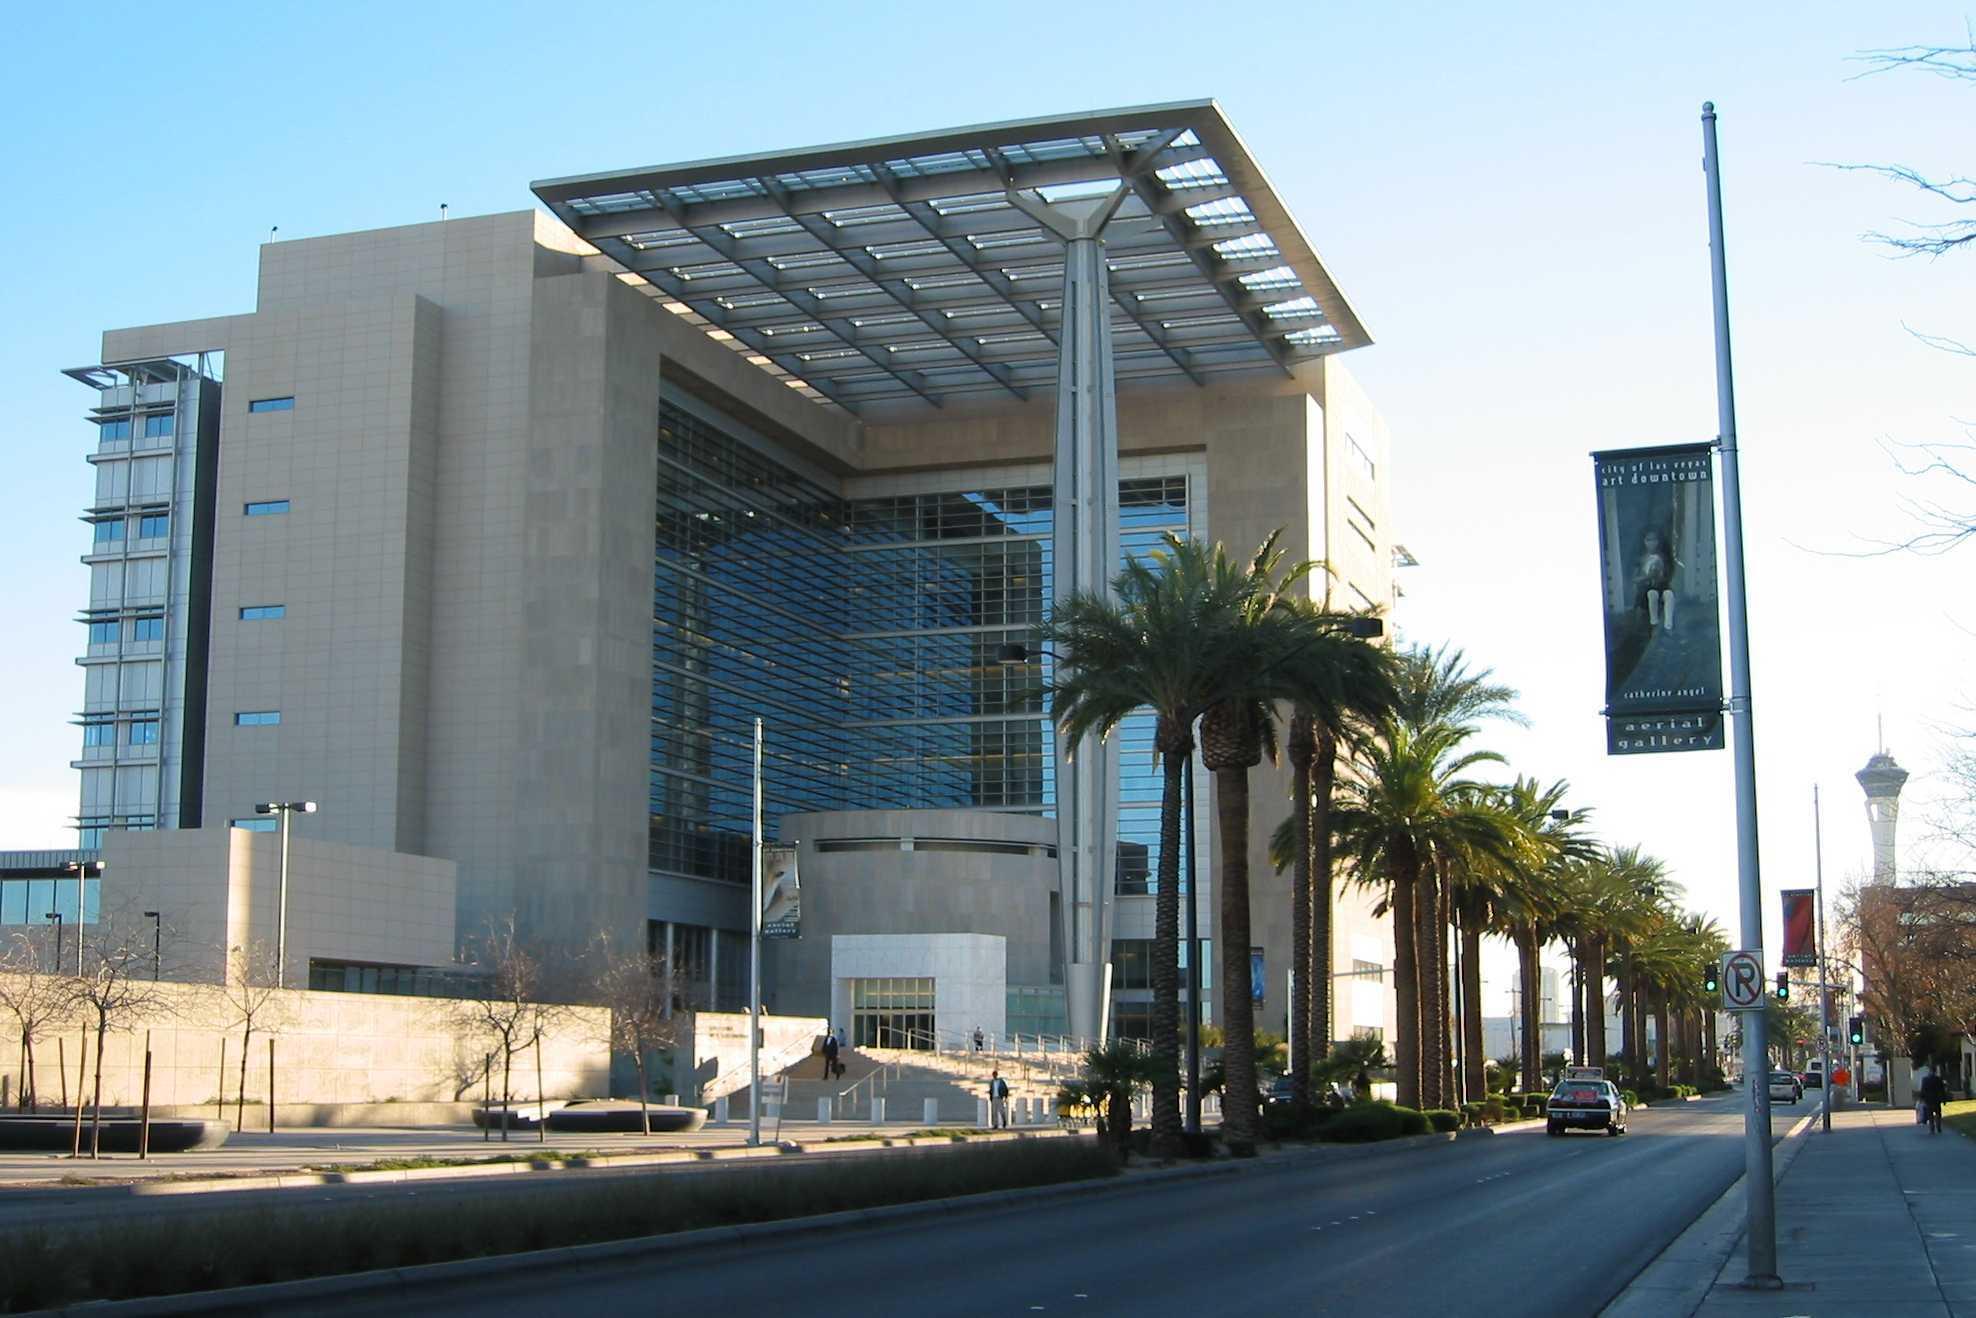 Las Vegas Justice Court >> Las Vegas Courthouse Shooting Wikipedia